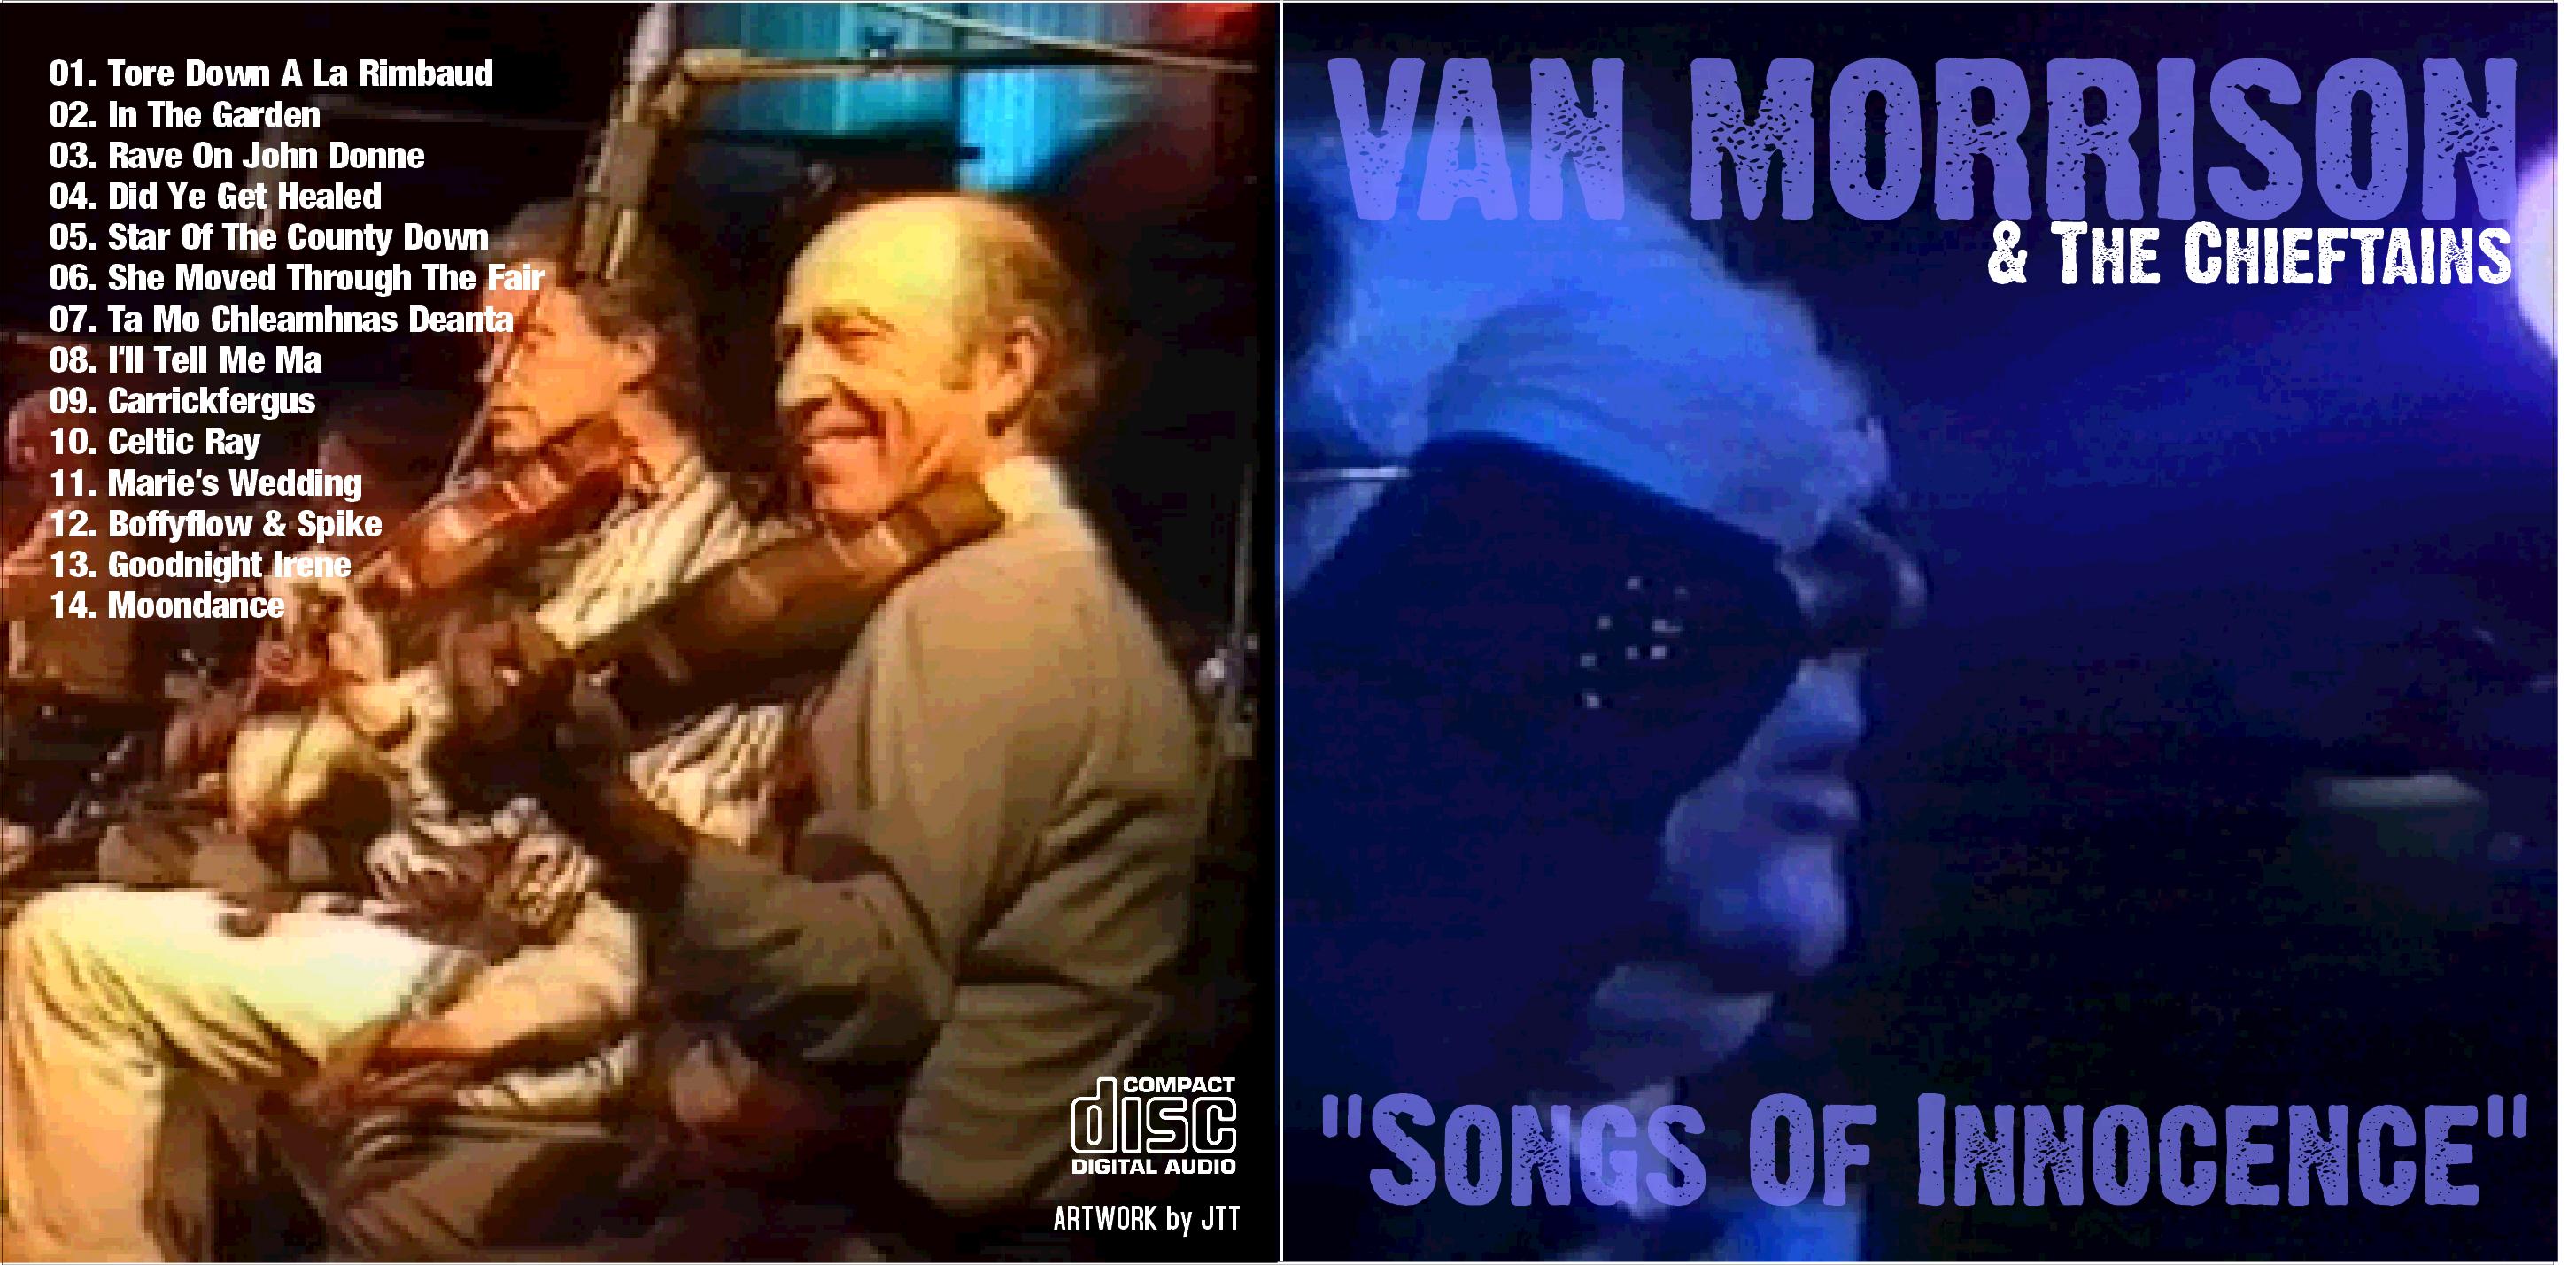 VanMorrisonAndTheChieftains1988-09-15SongsOfInnocenceUlsterHallBelfastIreland.jpeg